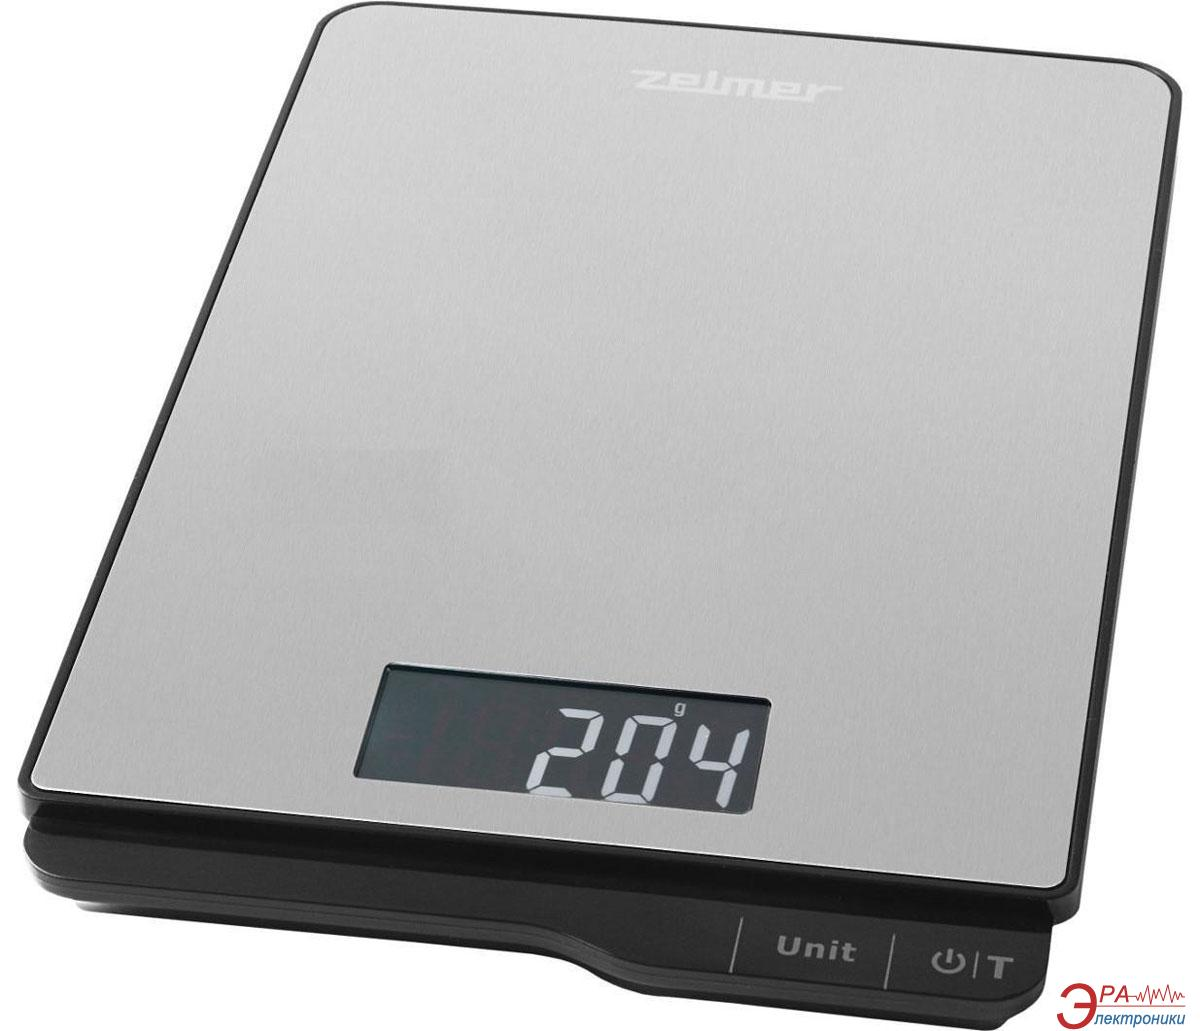 Кухонные весы Zelmer KS1500